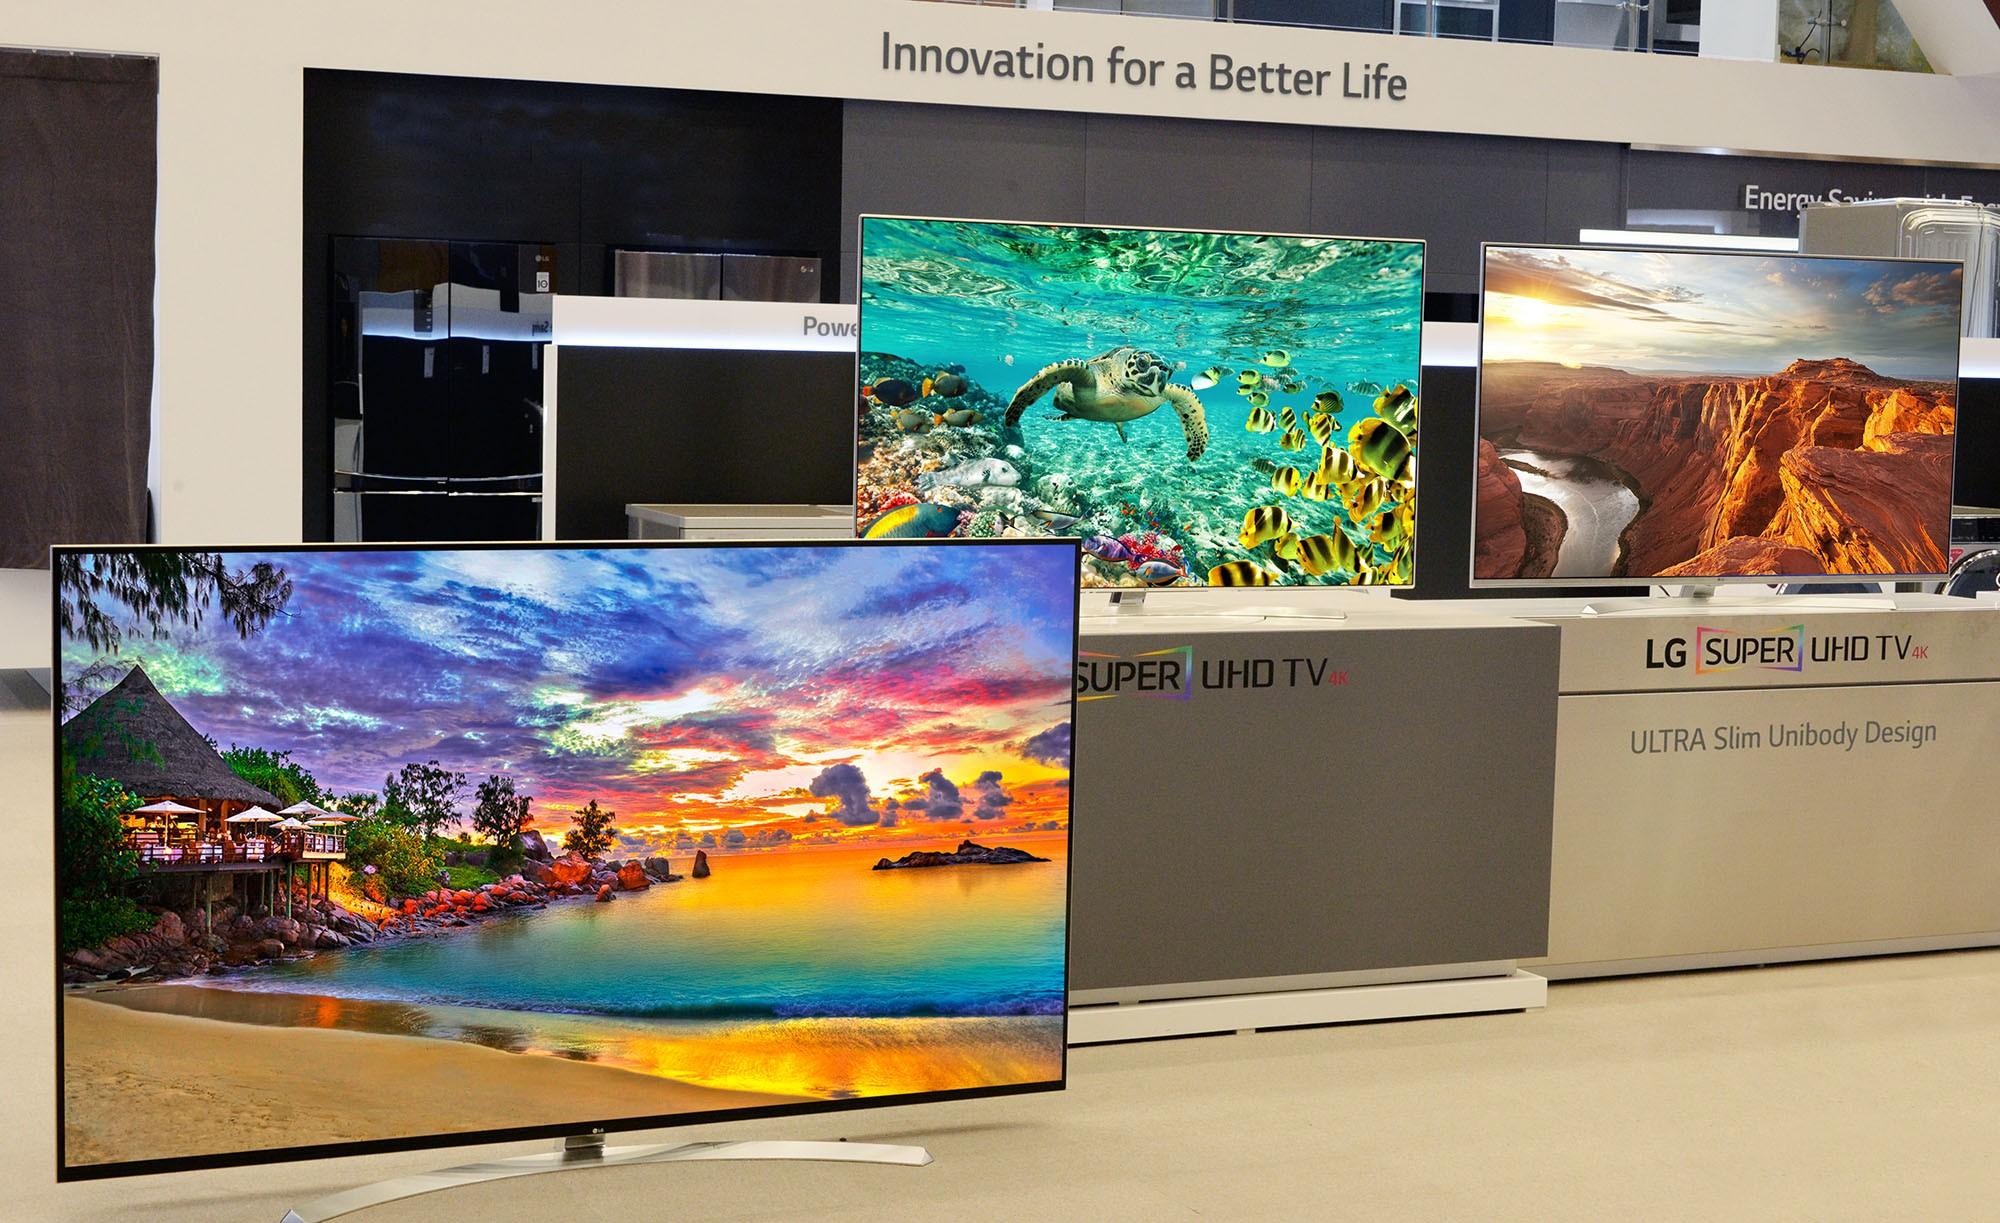 LG UHD TV_86UH9550_65UH9500_65UH8500